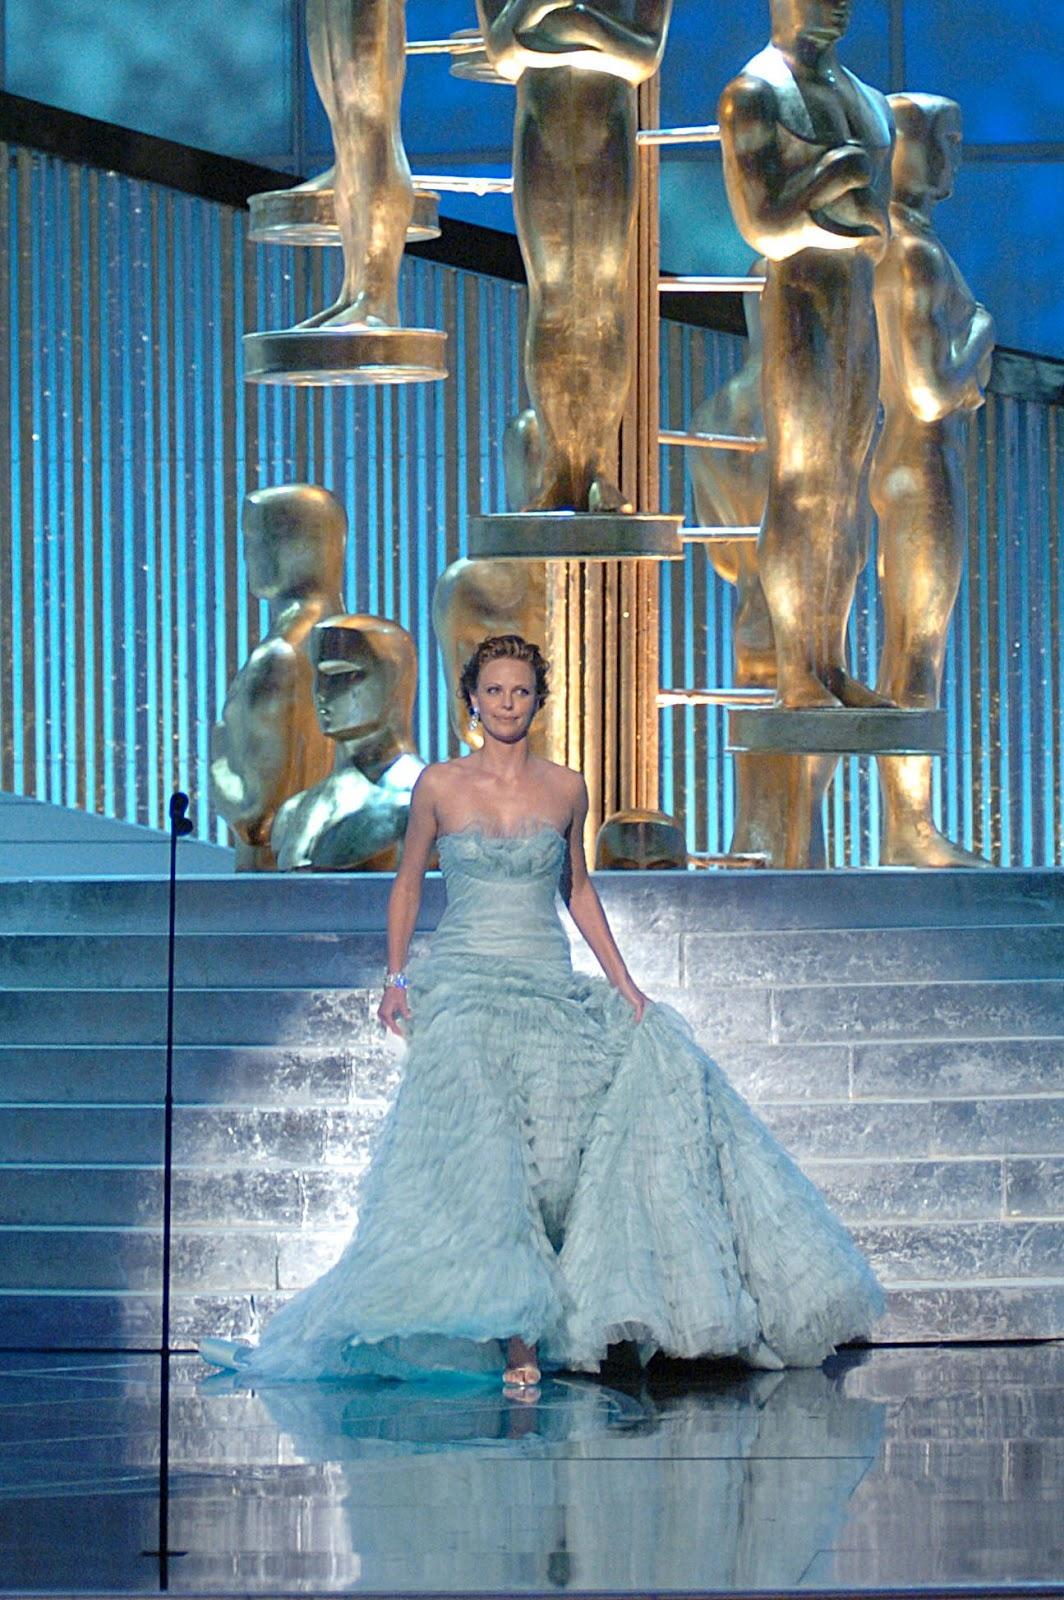 http://2.bp.blogspot.com/-oraBcuDHaws/T0fW0-ZyKJI/AAAAAAAAFd0/6hSoi2EQnnE/s1600/Charlize+red+carpet+Oscar+look+2005.jpg